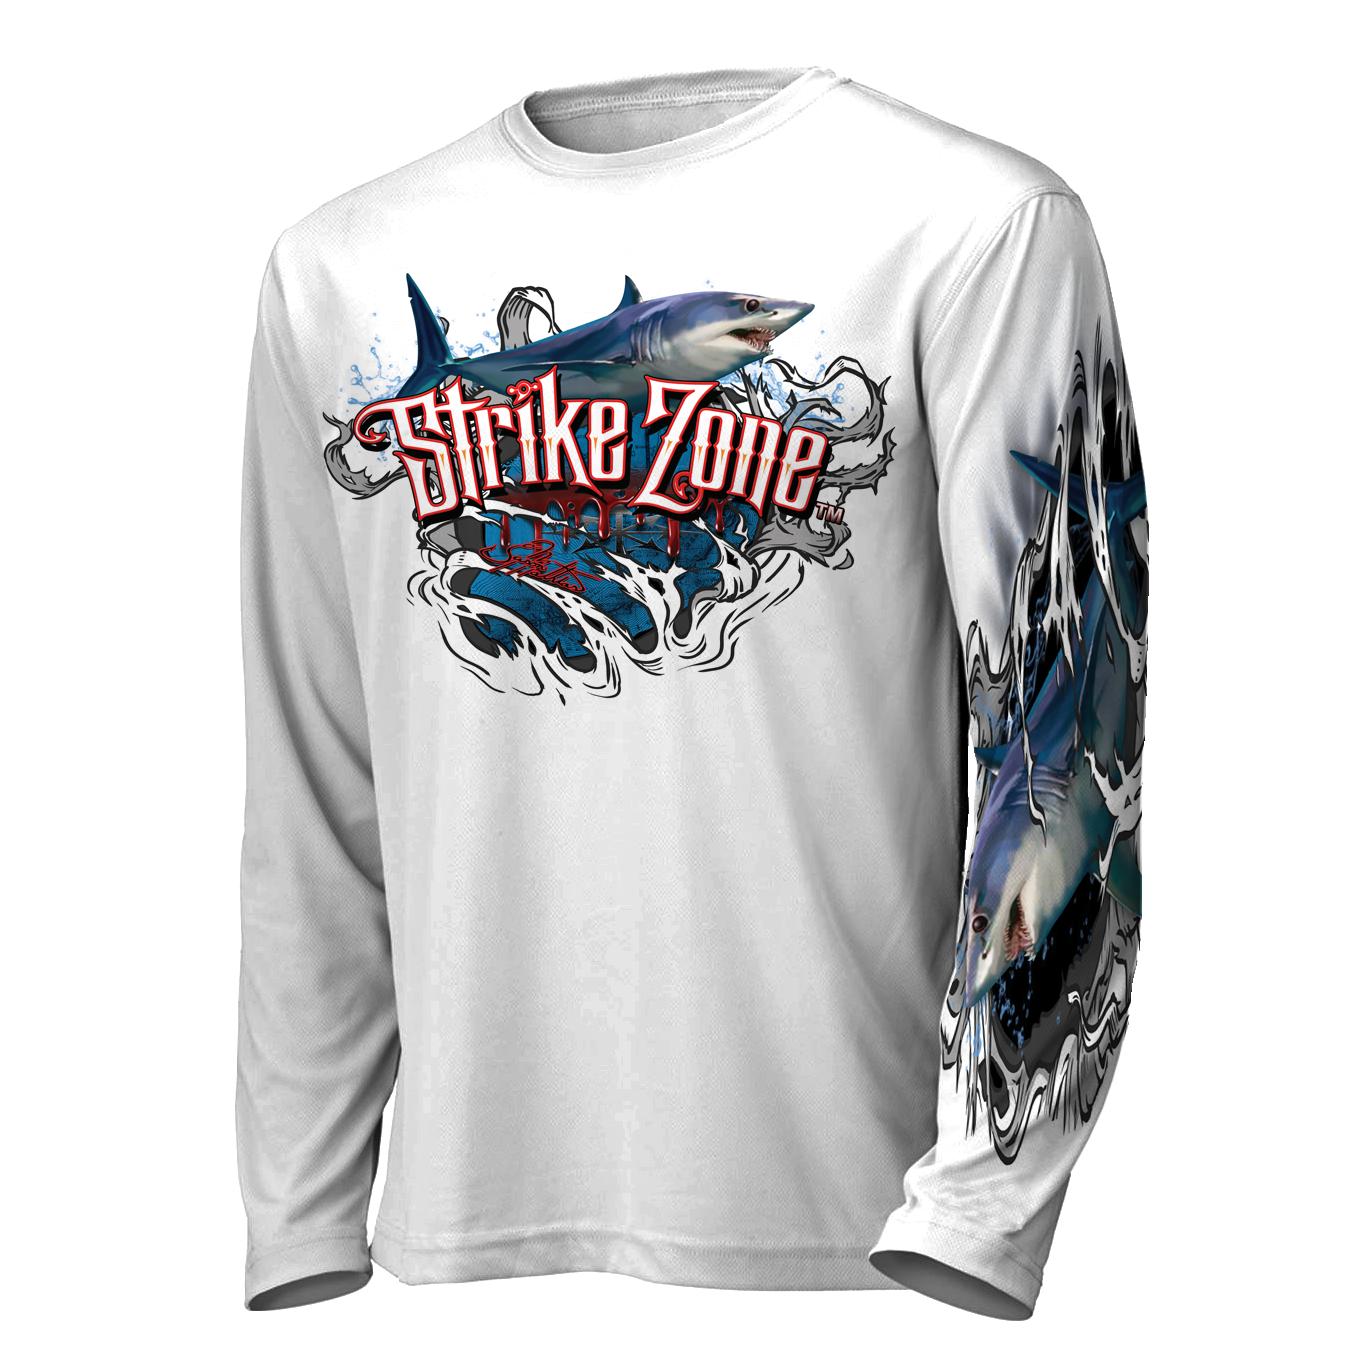 jason-mathias-strike-zone-mako-shark-fishing-shirt-front-white.png